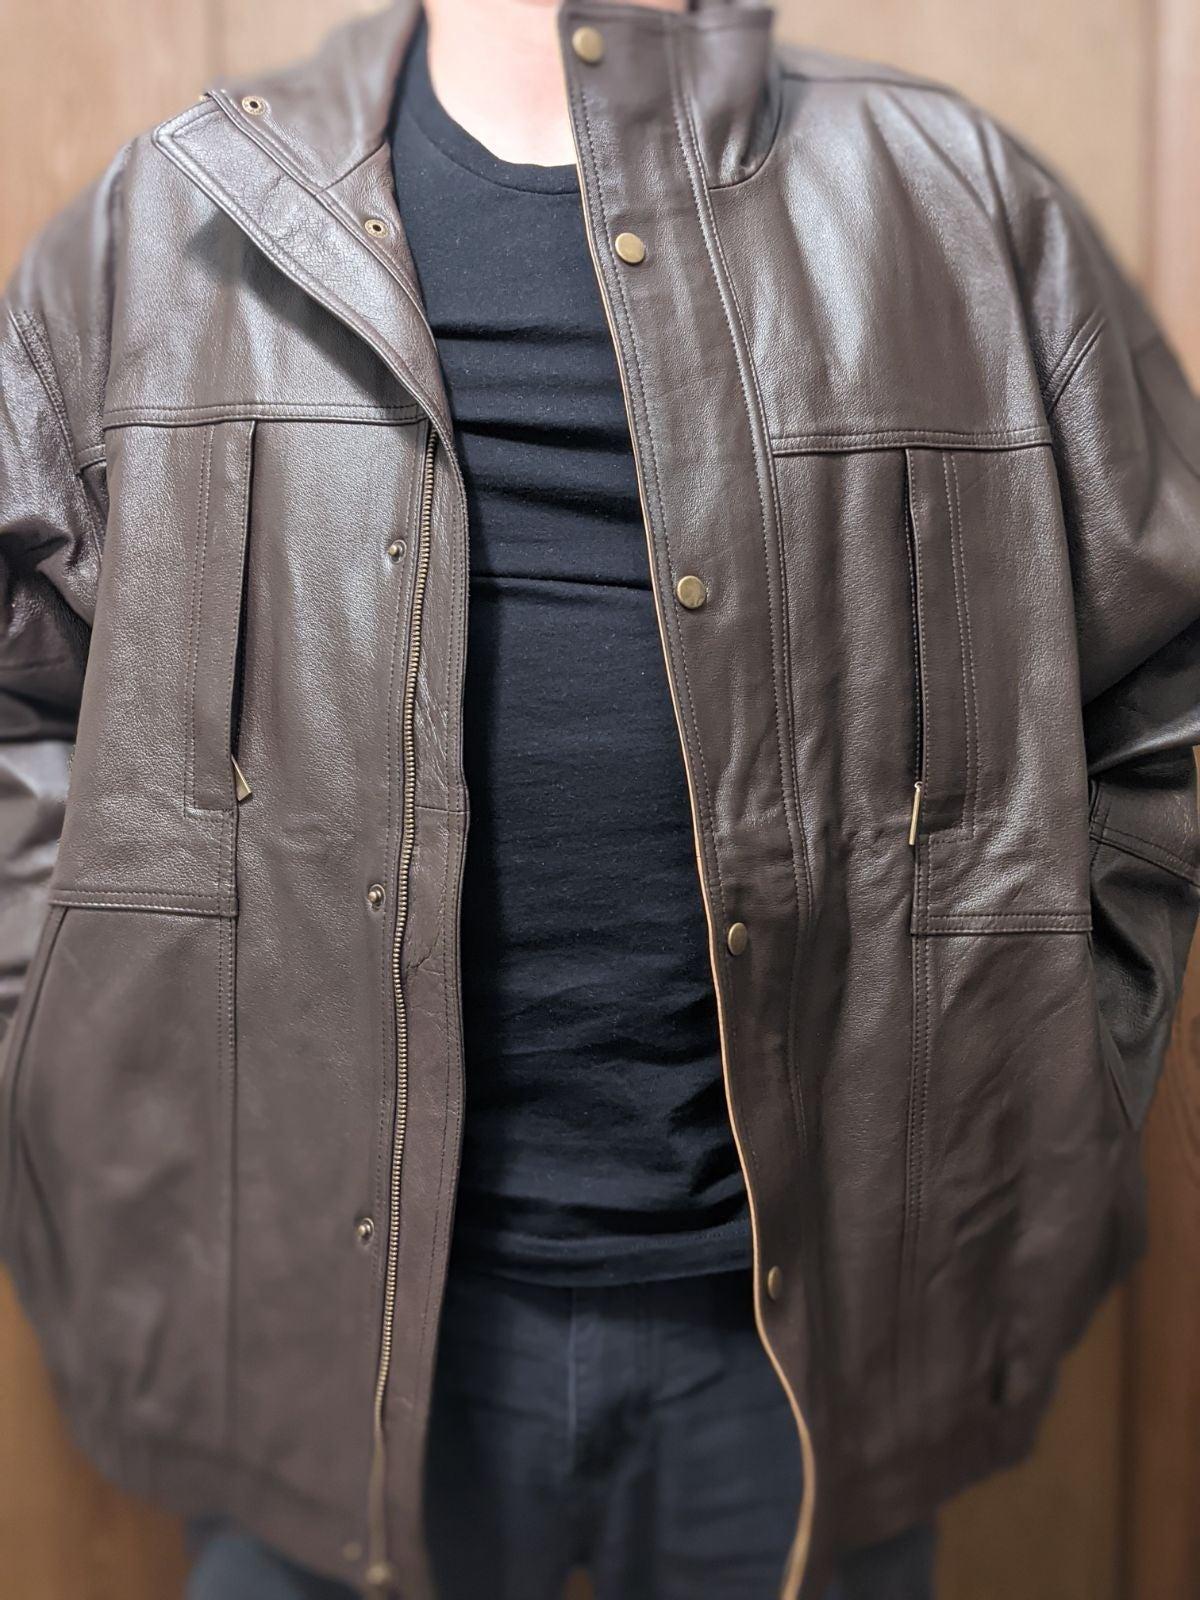 2XL Leather Jacket